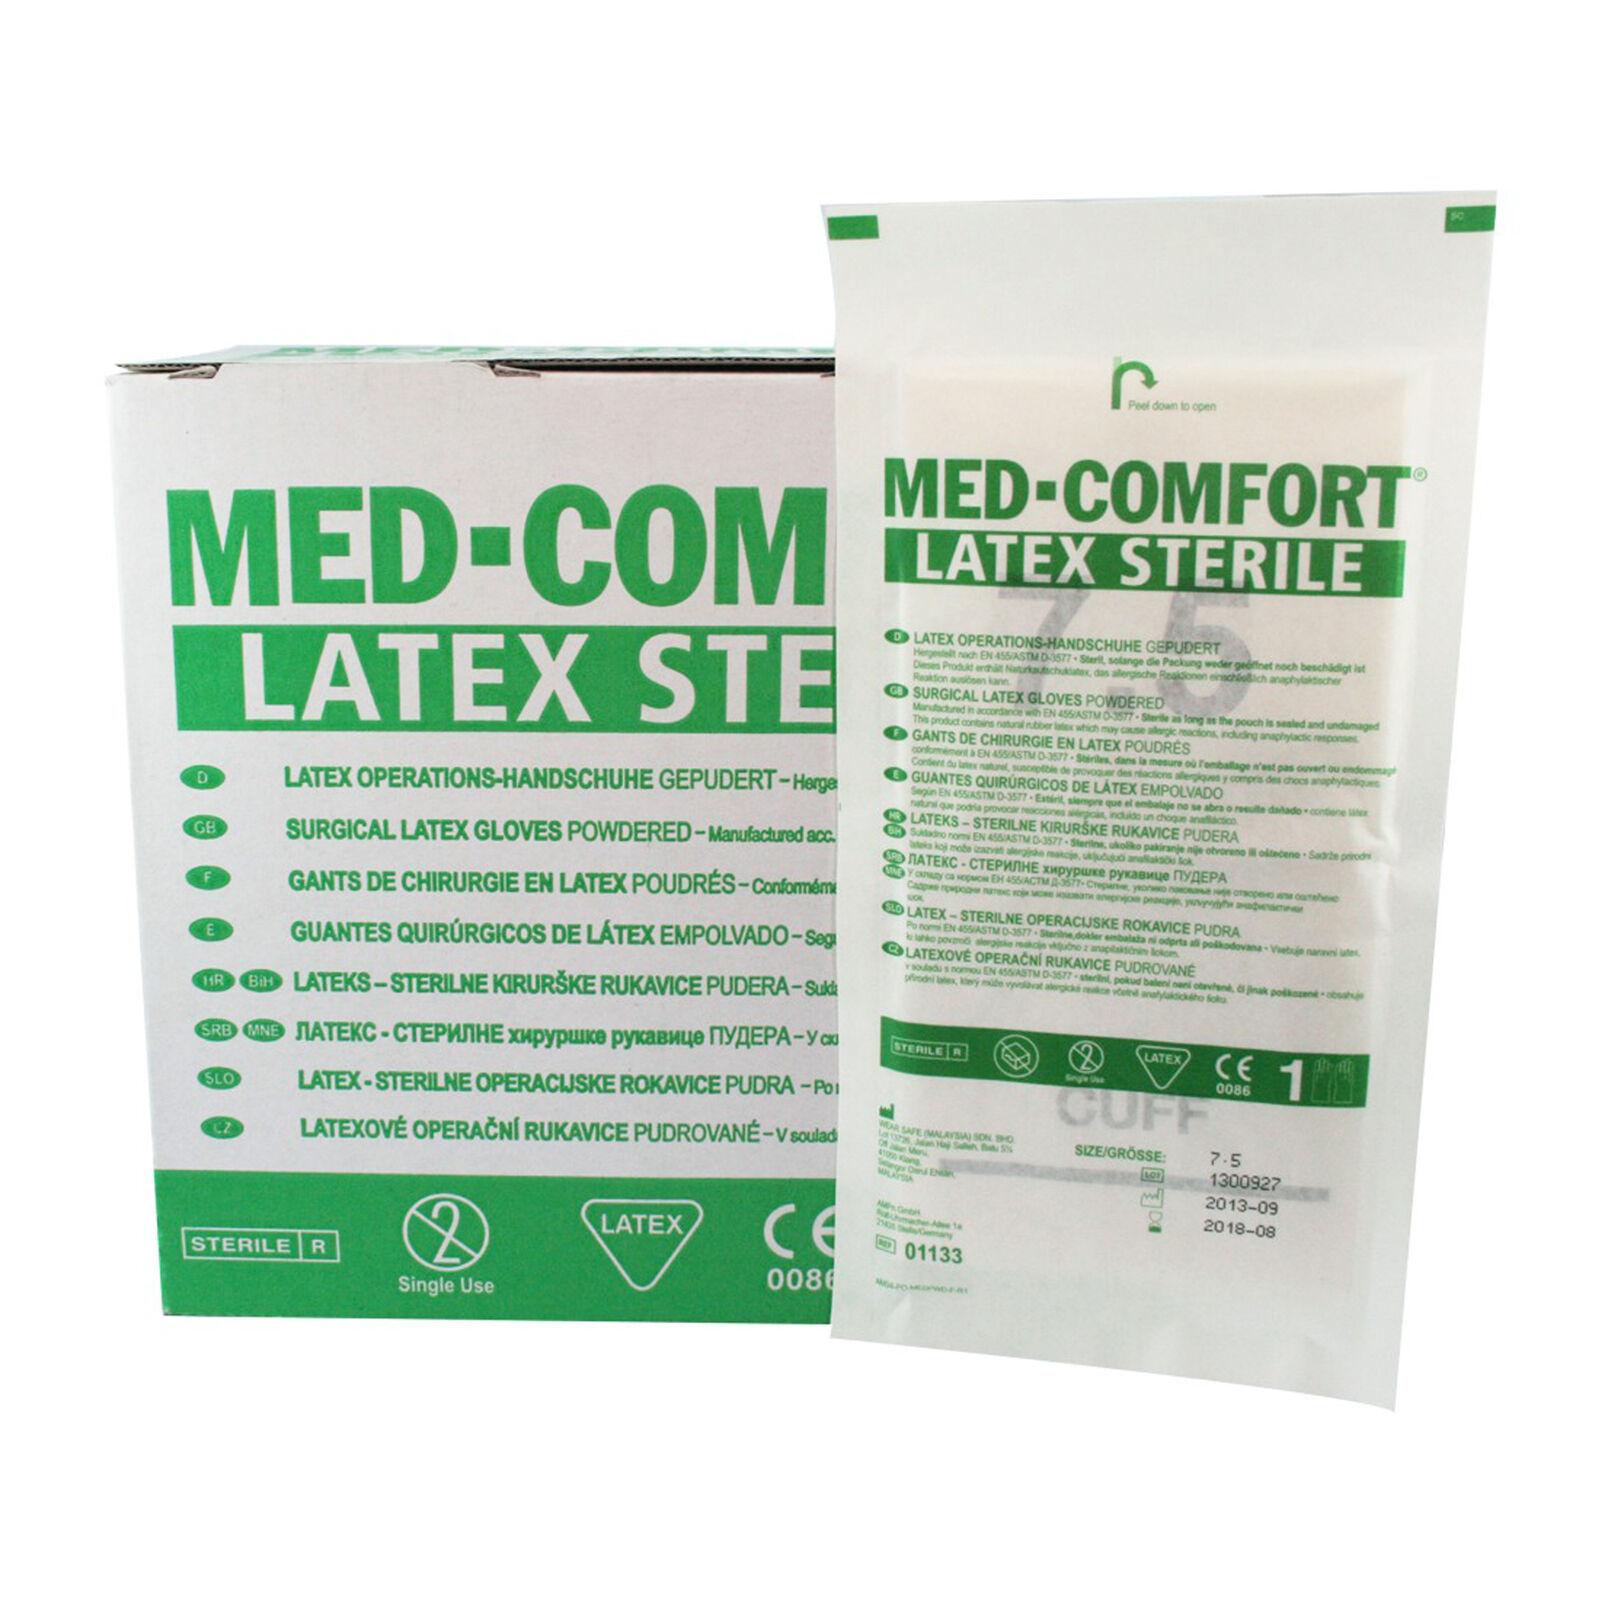 50 Paar MED-COMFORT Latex Operationshandschuhe steril gepudert OP-Handschuhe